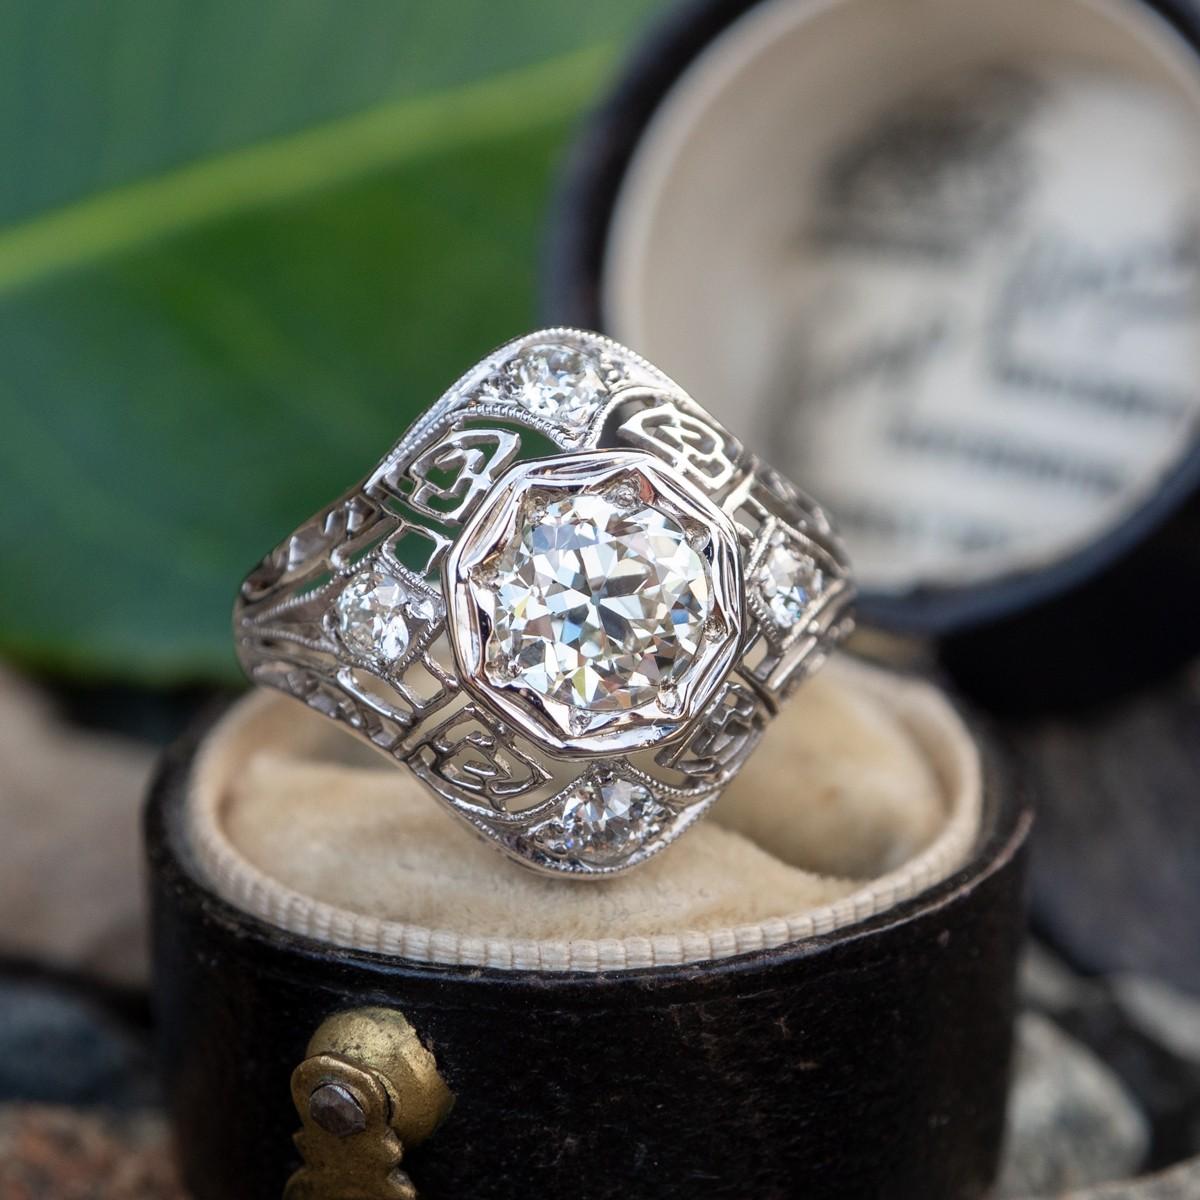 Antique Transitional Cut Diamond Filigree Engagement Ring